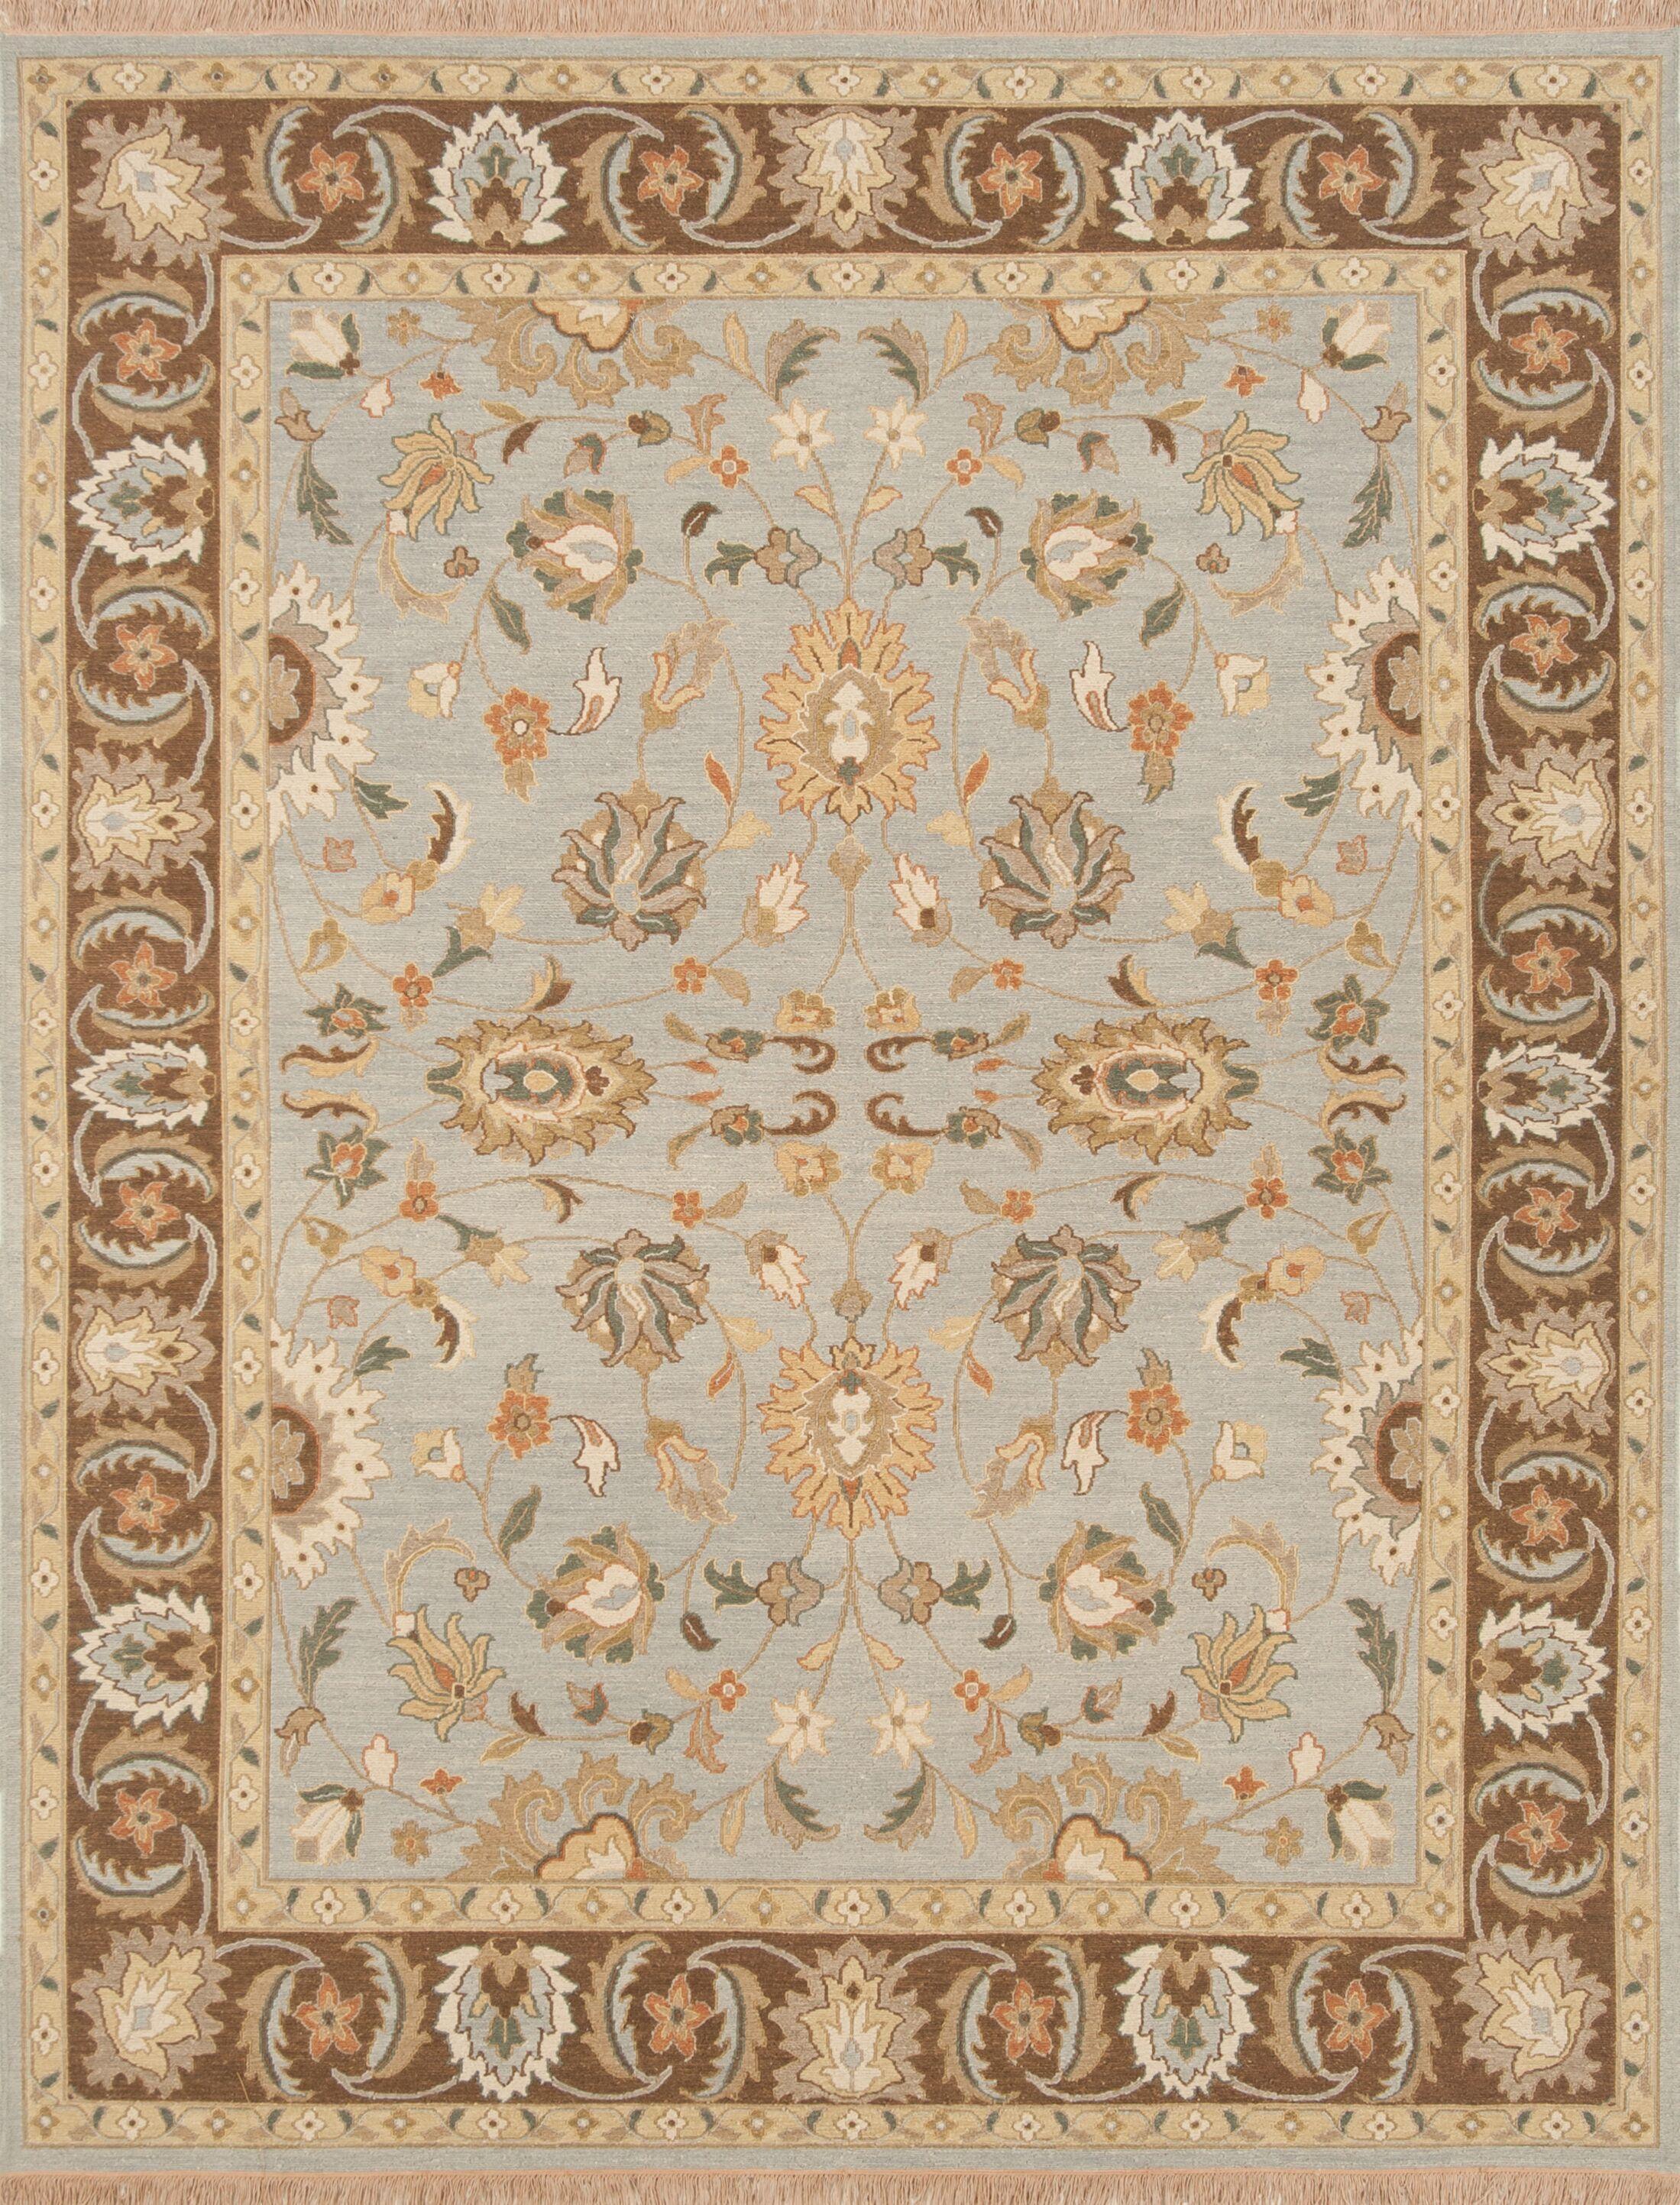 Rickey Hand Woven Wool Aqua/Brown Area Rug Size: 6' x 9'